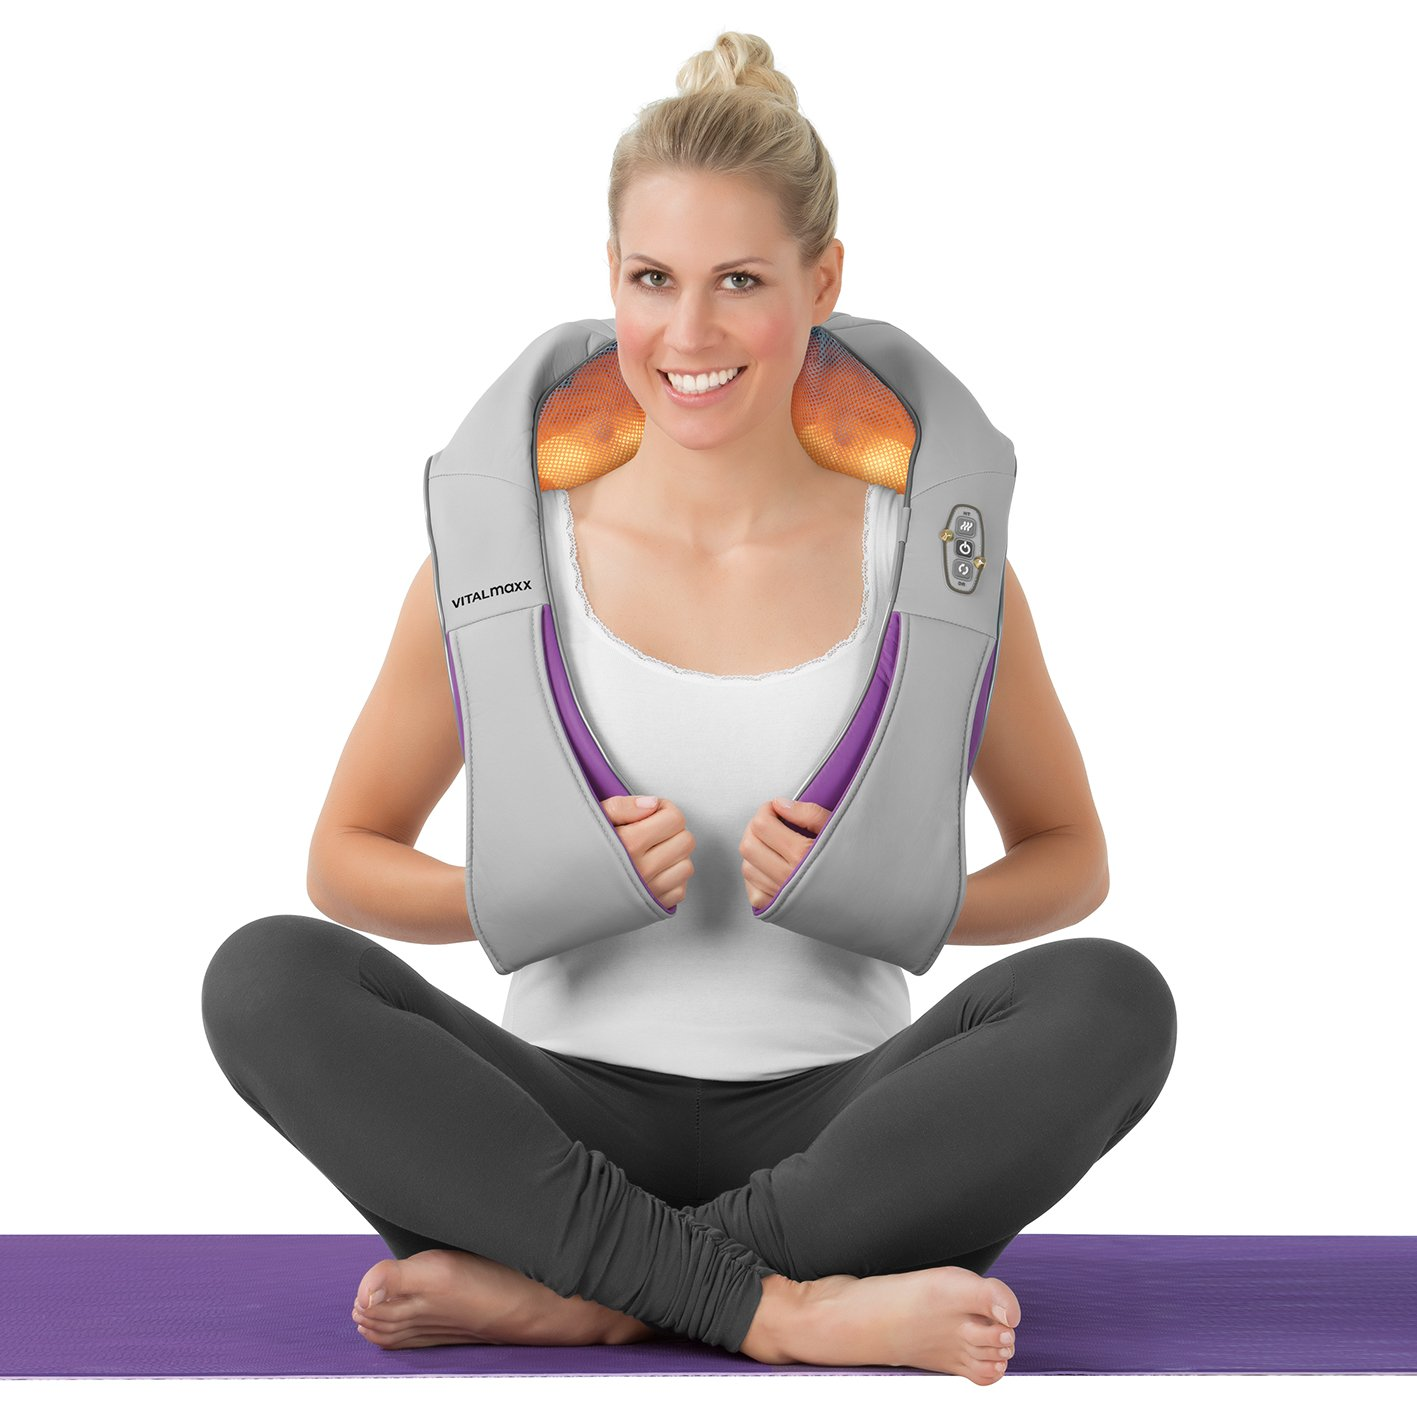 Vitalmaxx Shiatsu Massagegerät Shiatsu Wärme Therapie 3d Rotation